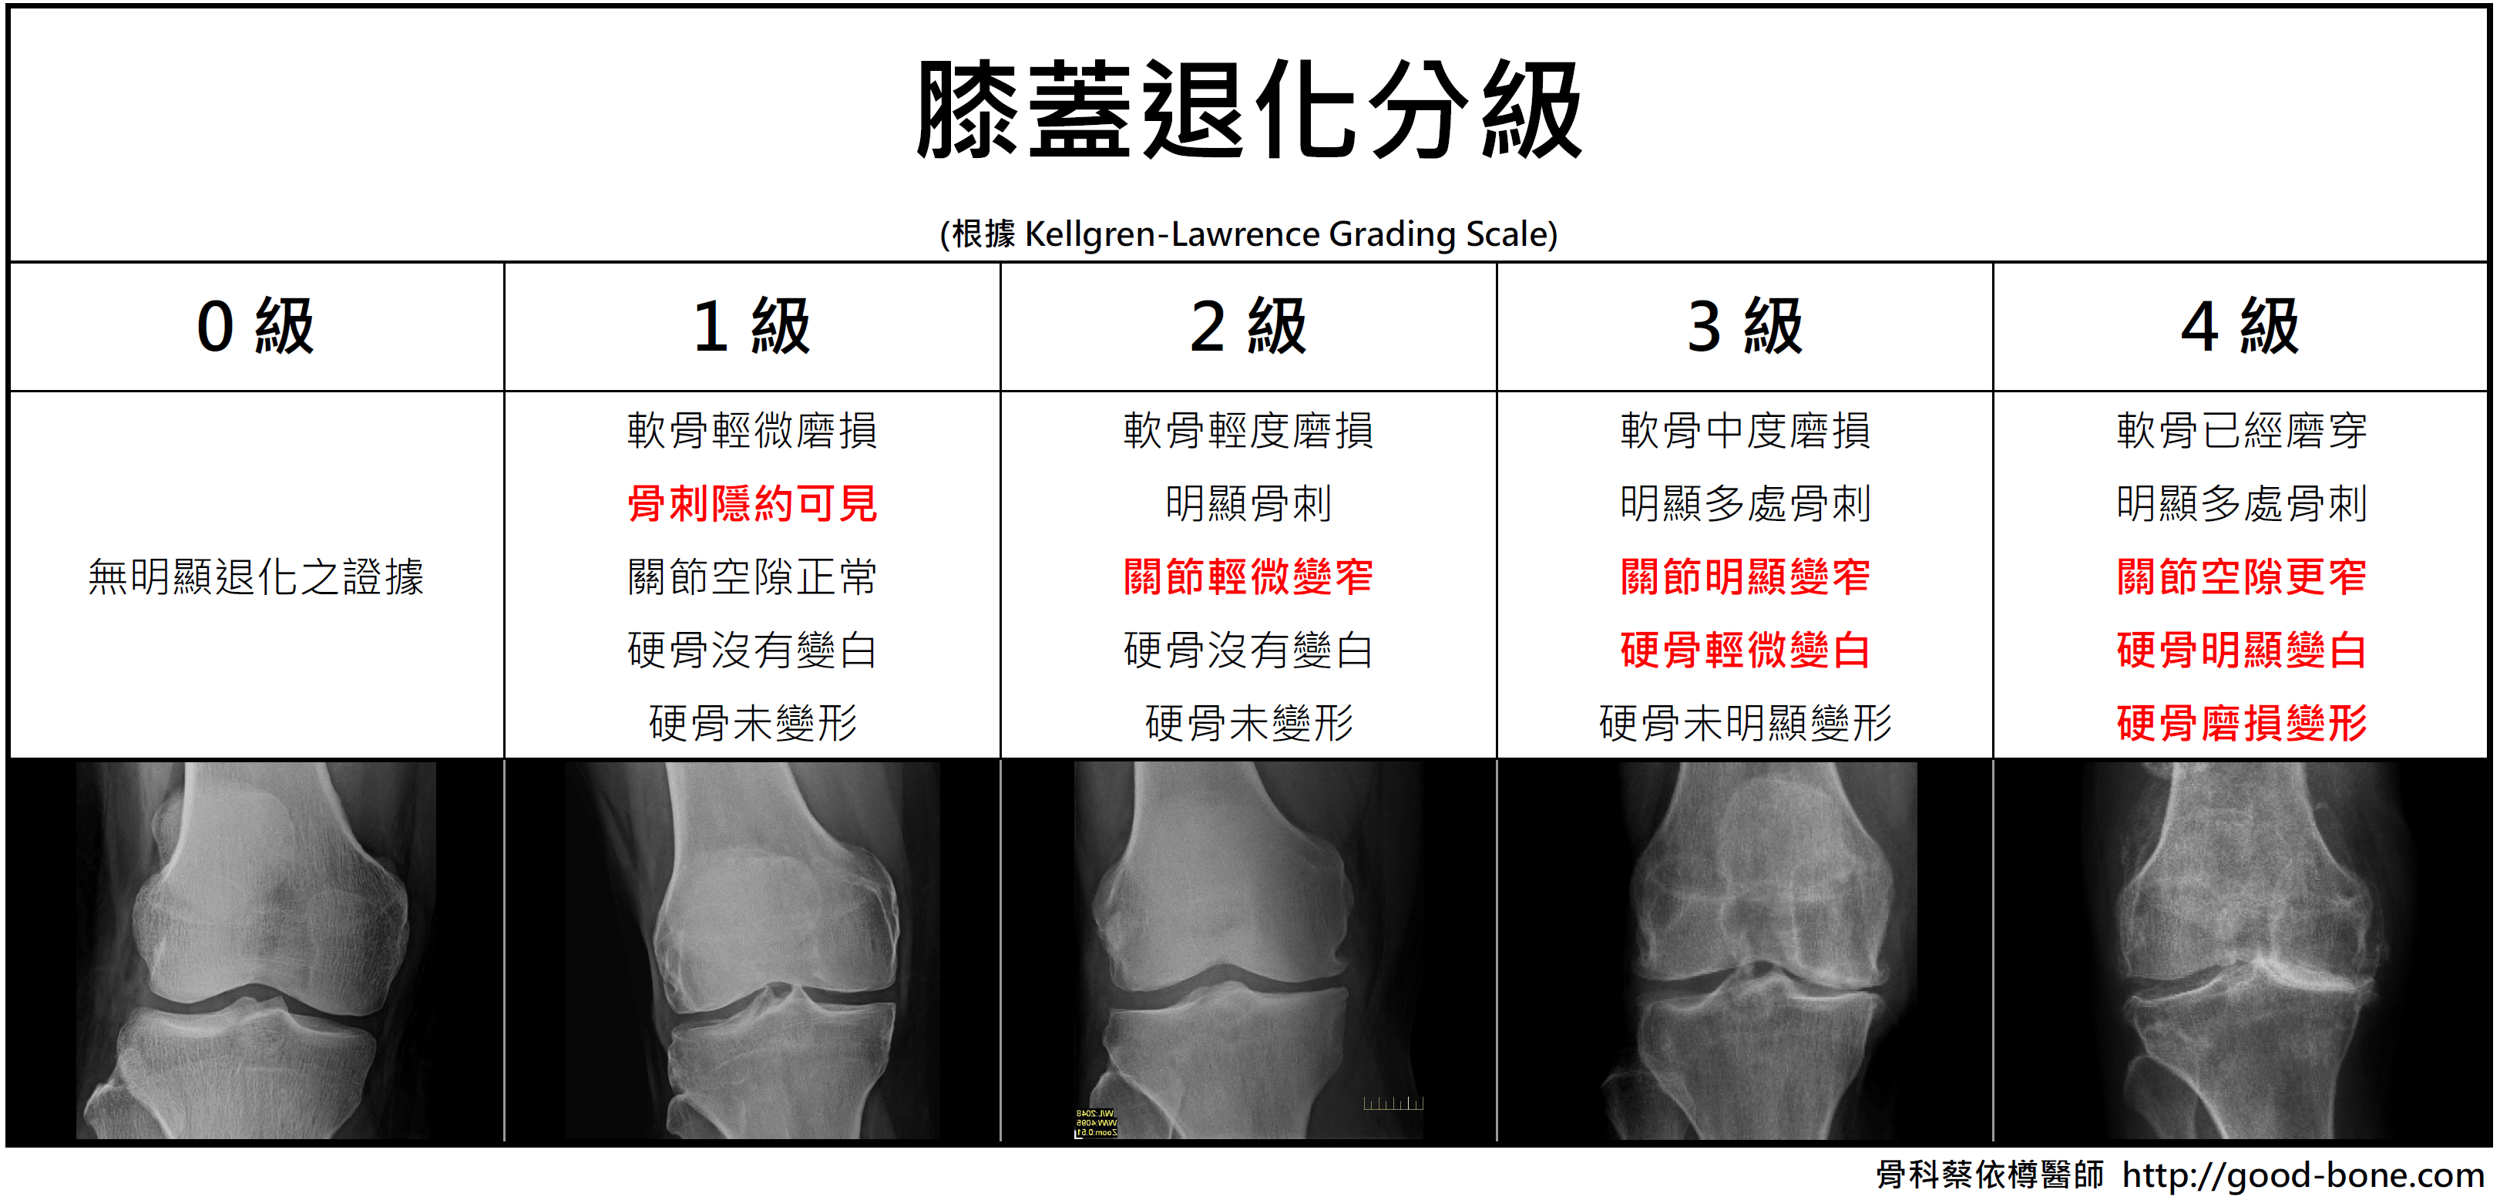 膝關節分級 Kellgren-Lawrence ; FB 骨科蔡依樽醫師 https://good-bone.com/